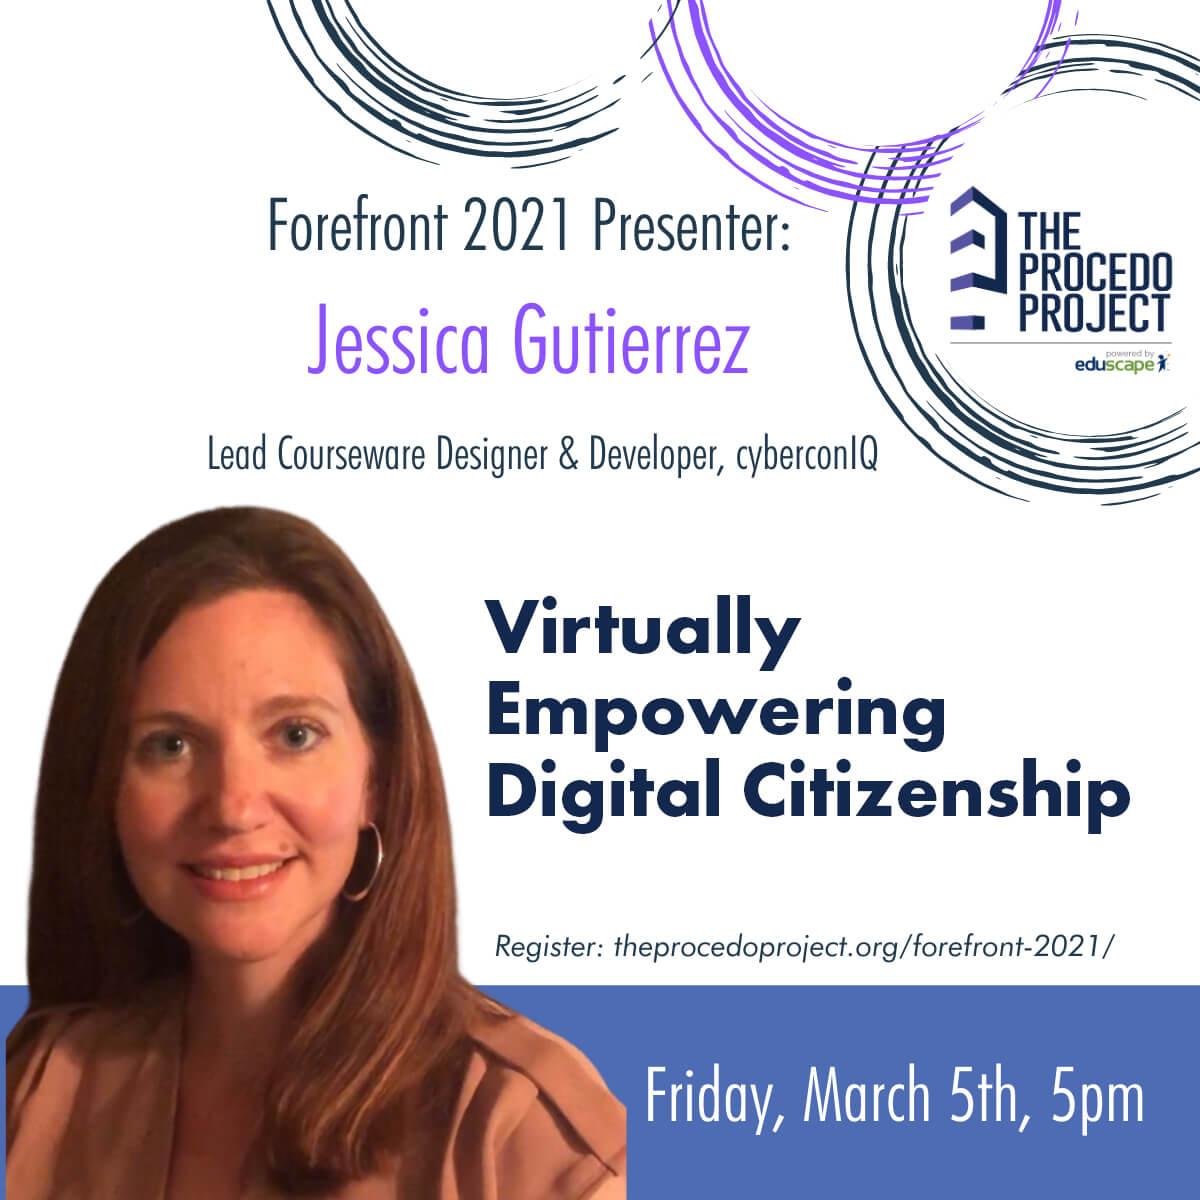 cyberconIQ - Jessica Gutierrez - Forefront 2021 Speaker